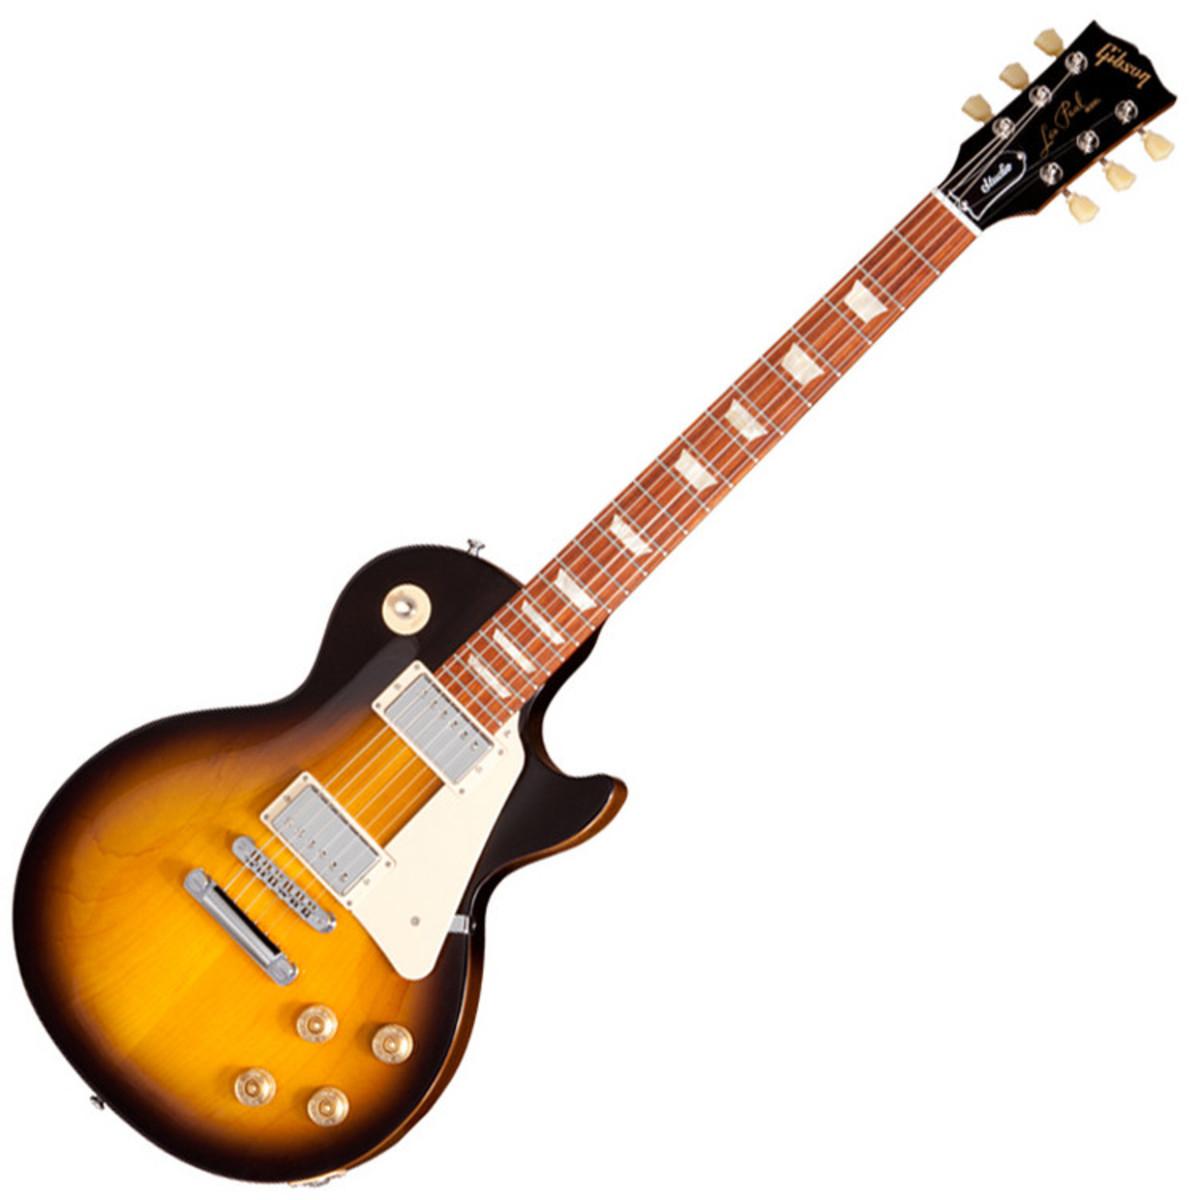 gibson les paul studio electric guitar 2013 model vintage sunburst at gear4music. Black Bedroom Furniture Sets. Home Design Ideas